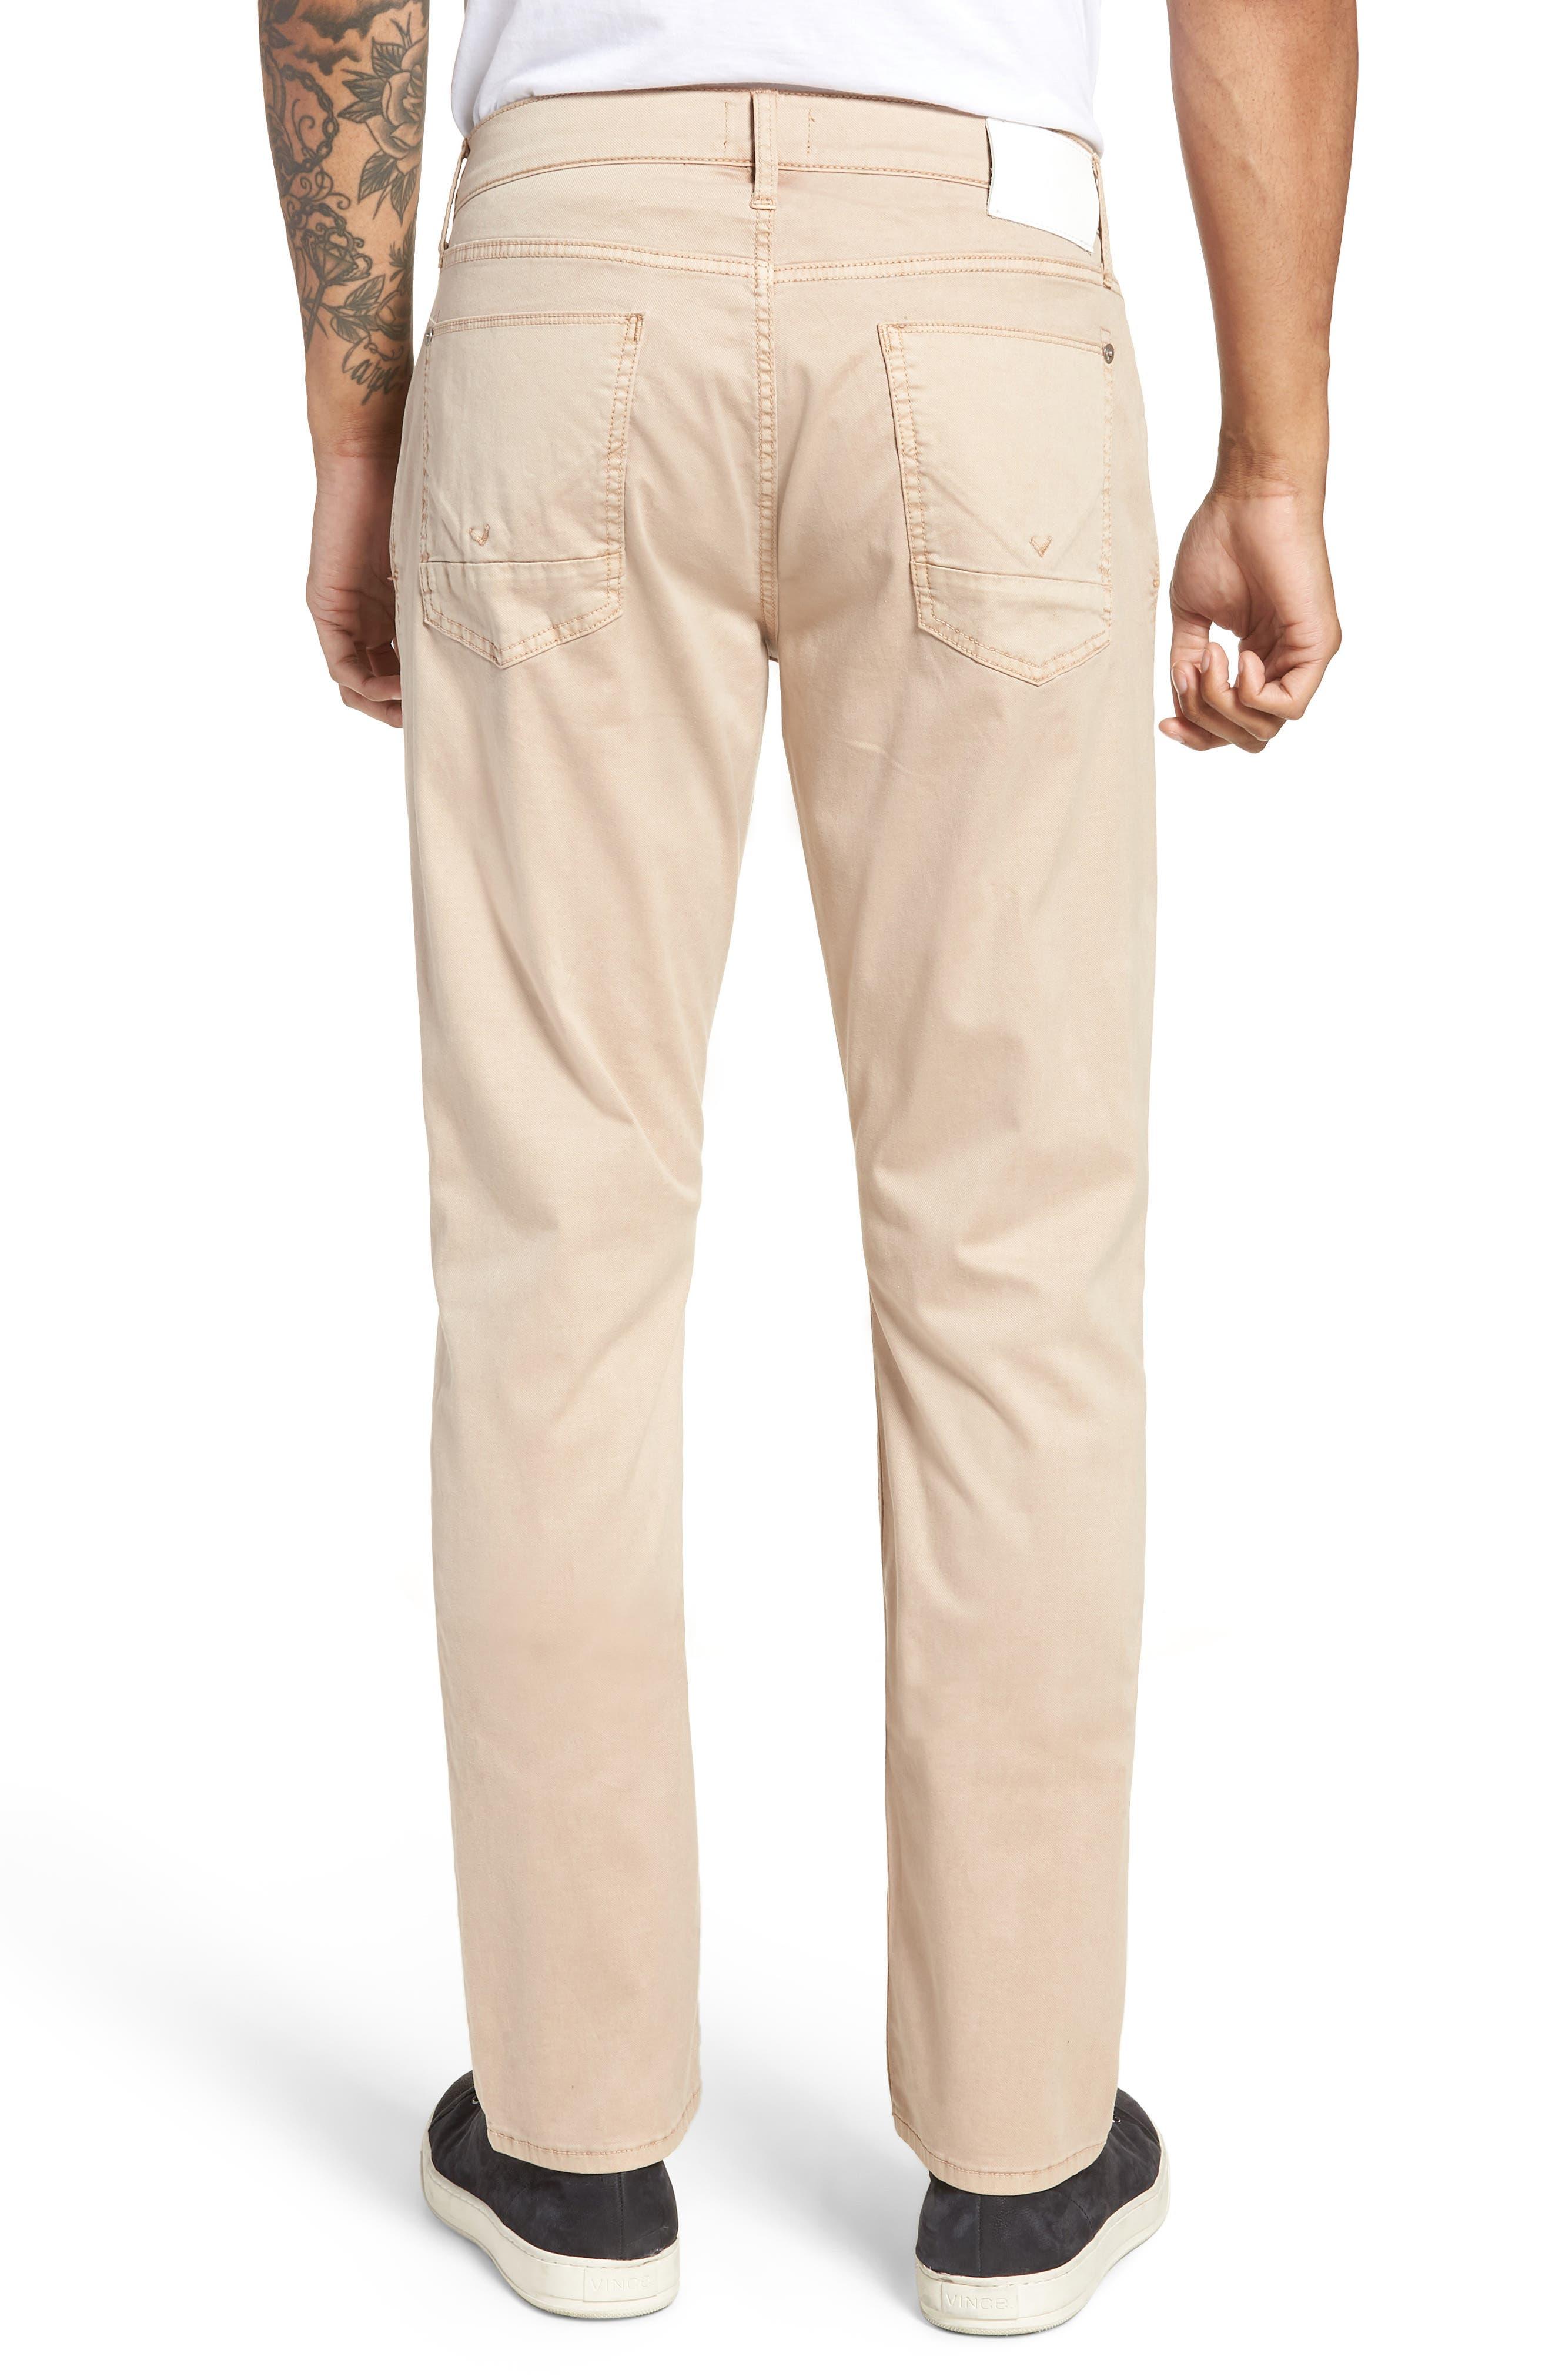 Blake Slim Fit Jeans,                             Alternate thumbnail 2, color,                             250